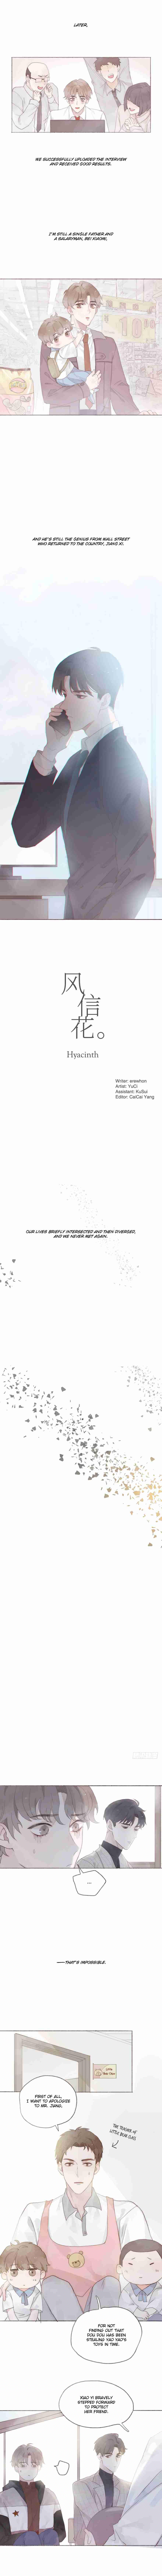 https://img2.nineanime.com/comics/pic2/17/26321/729621/58b4095fb5335282cc3fde57c643da38.jpg Page 1